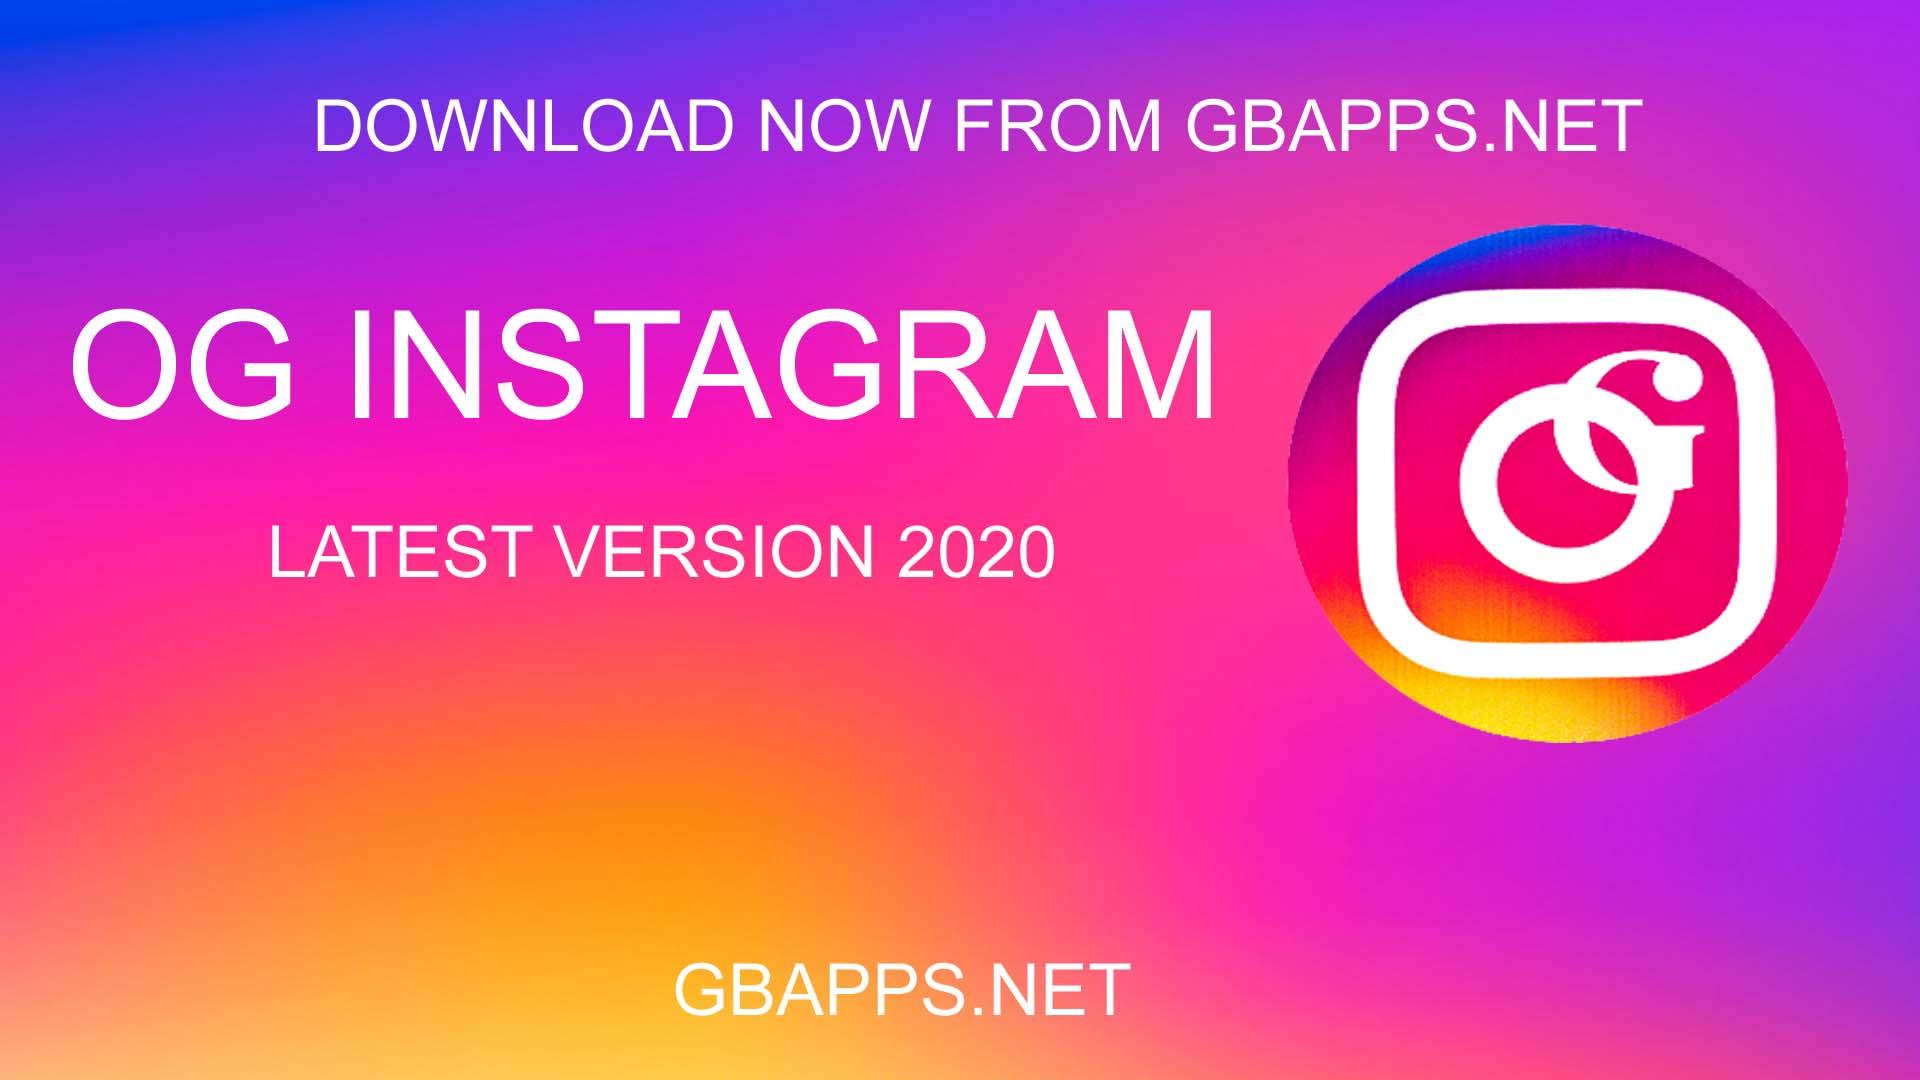 OG Instagram Apk Descarga 10.15 (Oficial) Última versión 2020